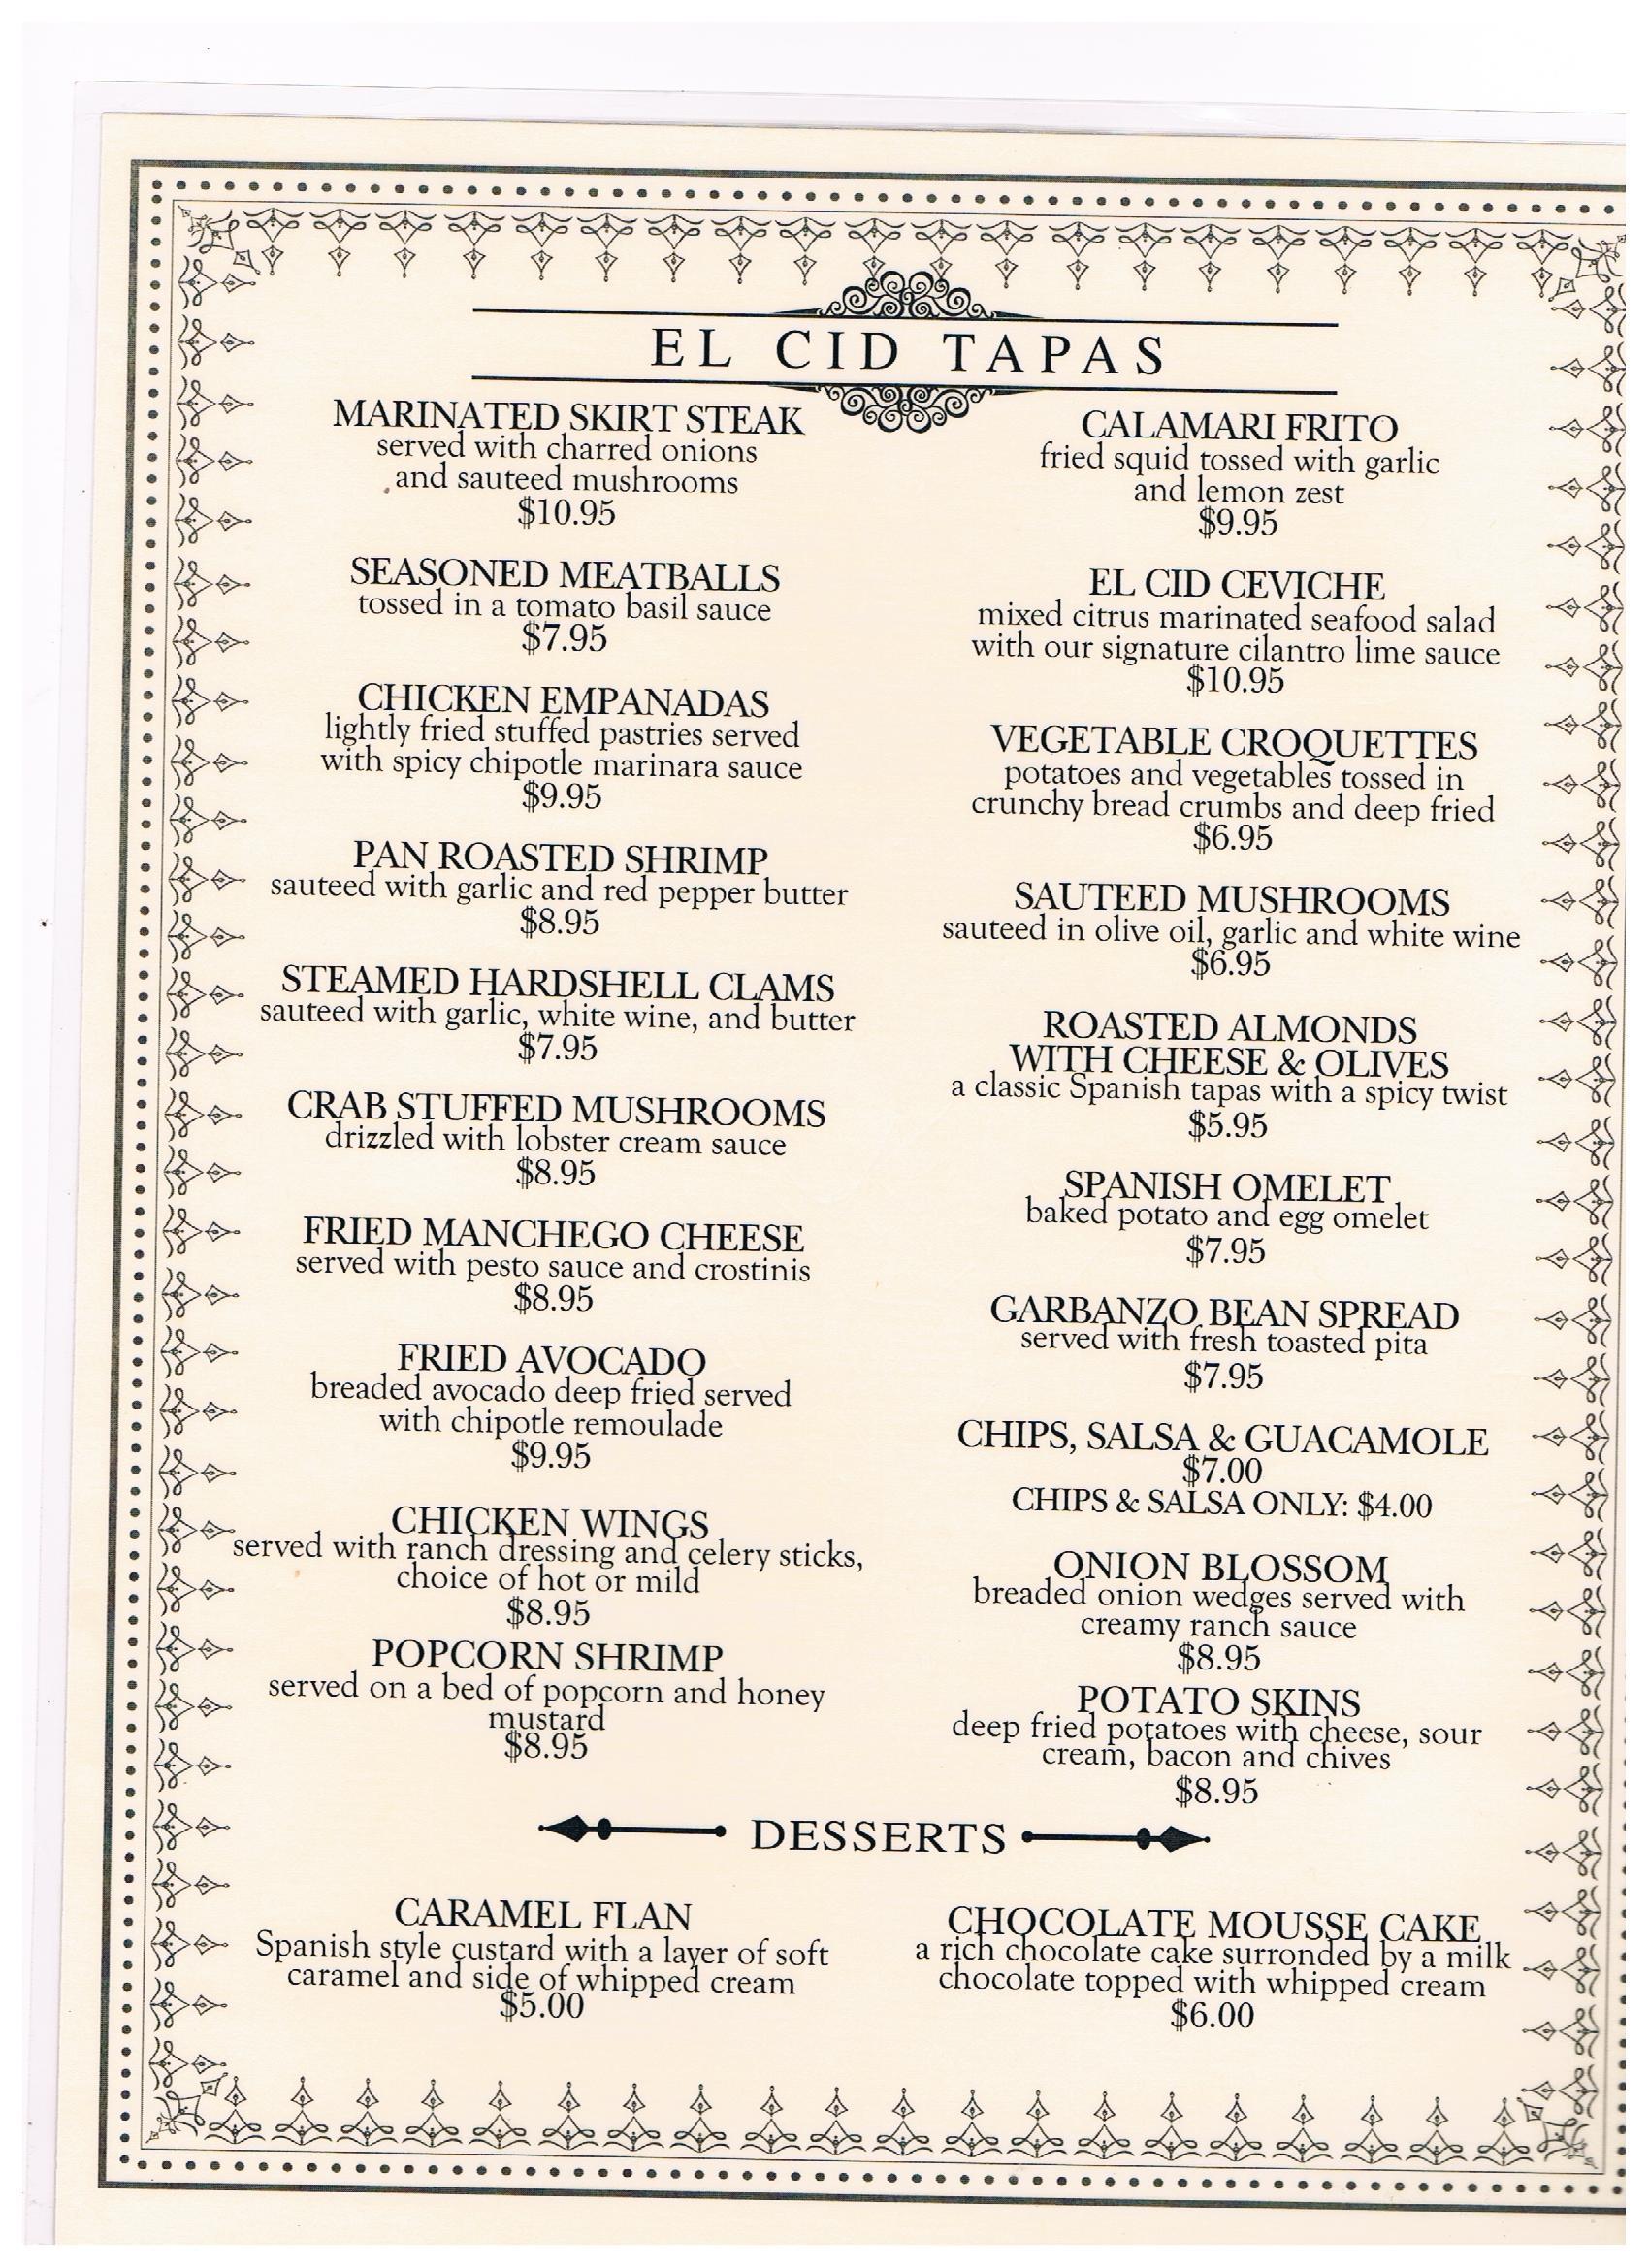 Weekly menu template word for Tapas menu template